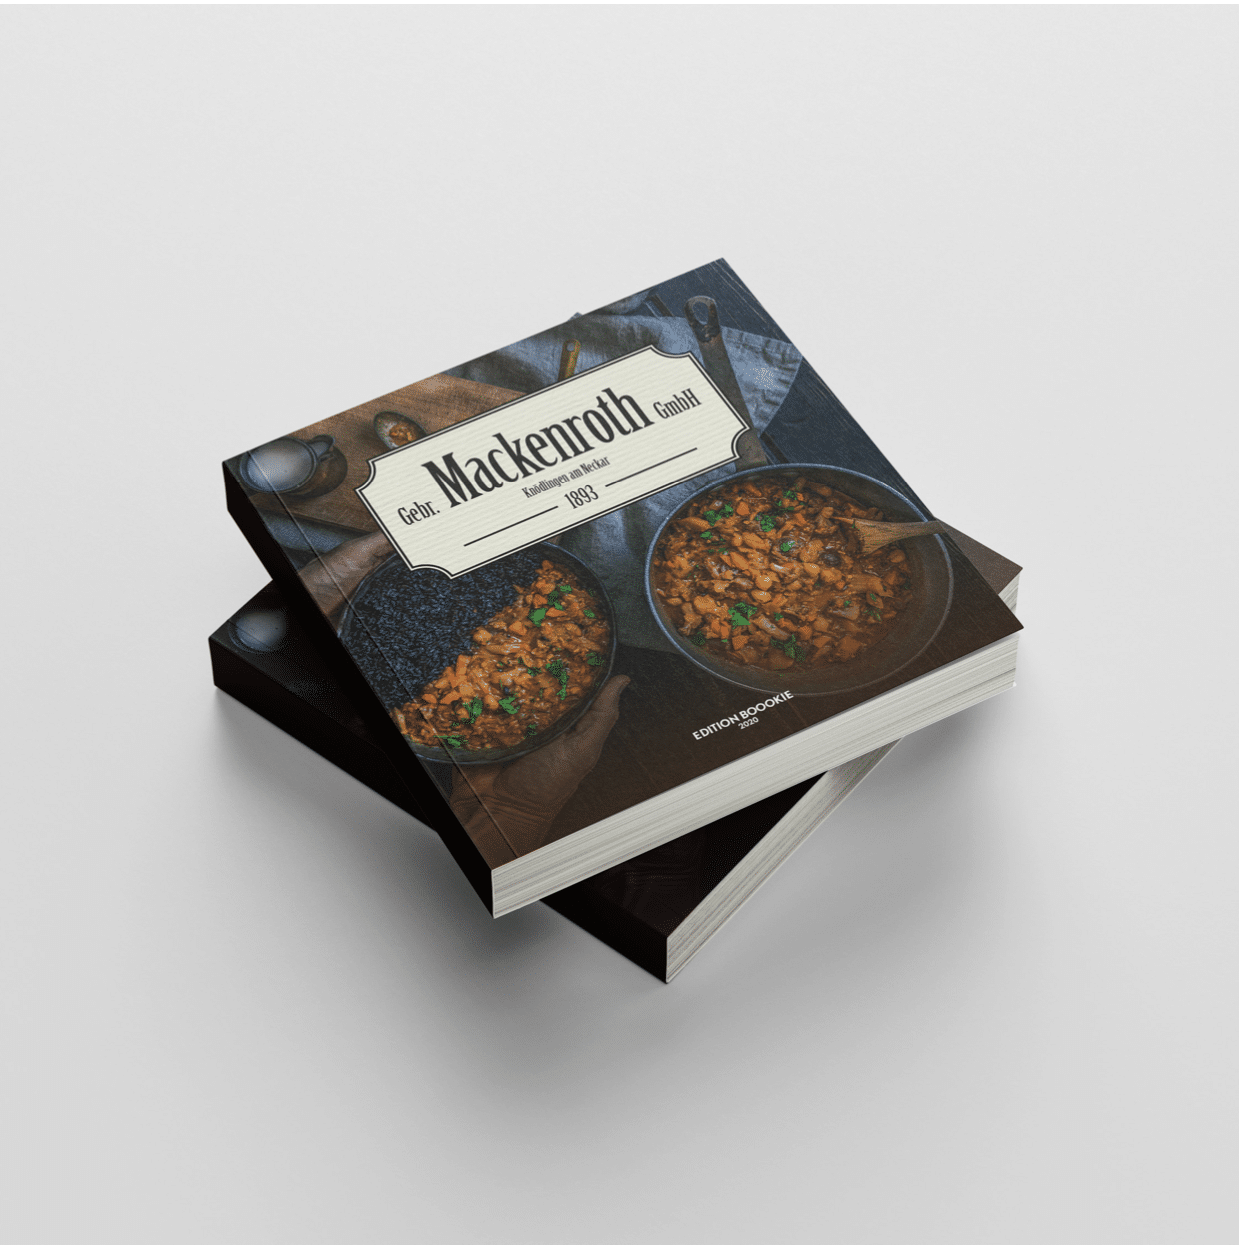 Mackenroth GmbH